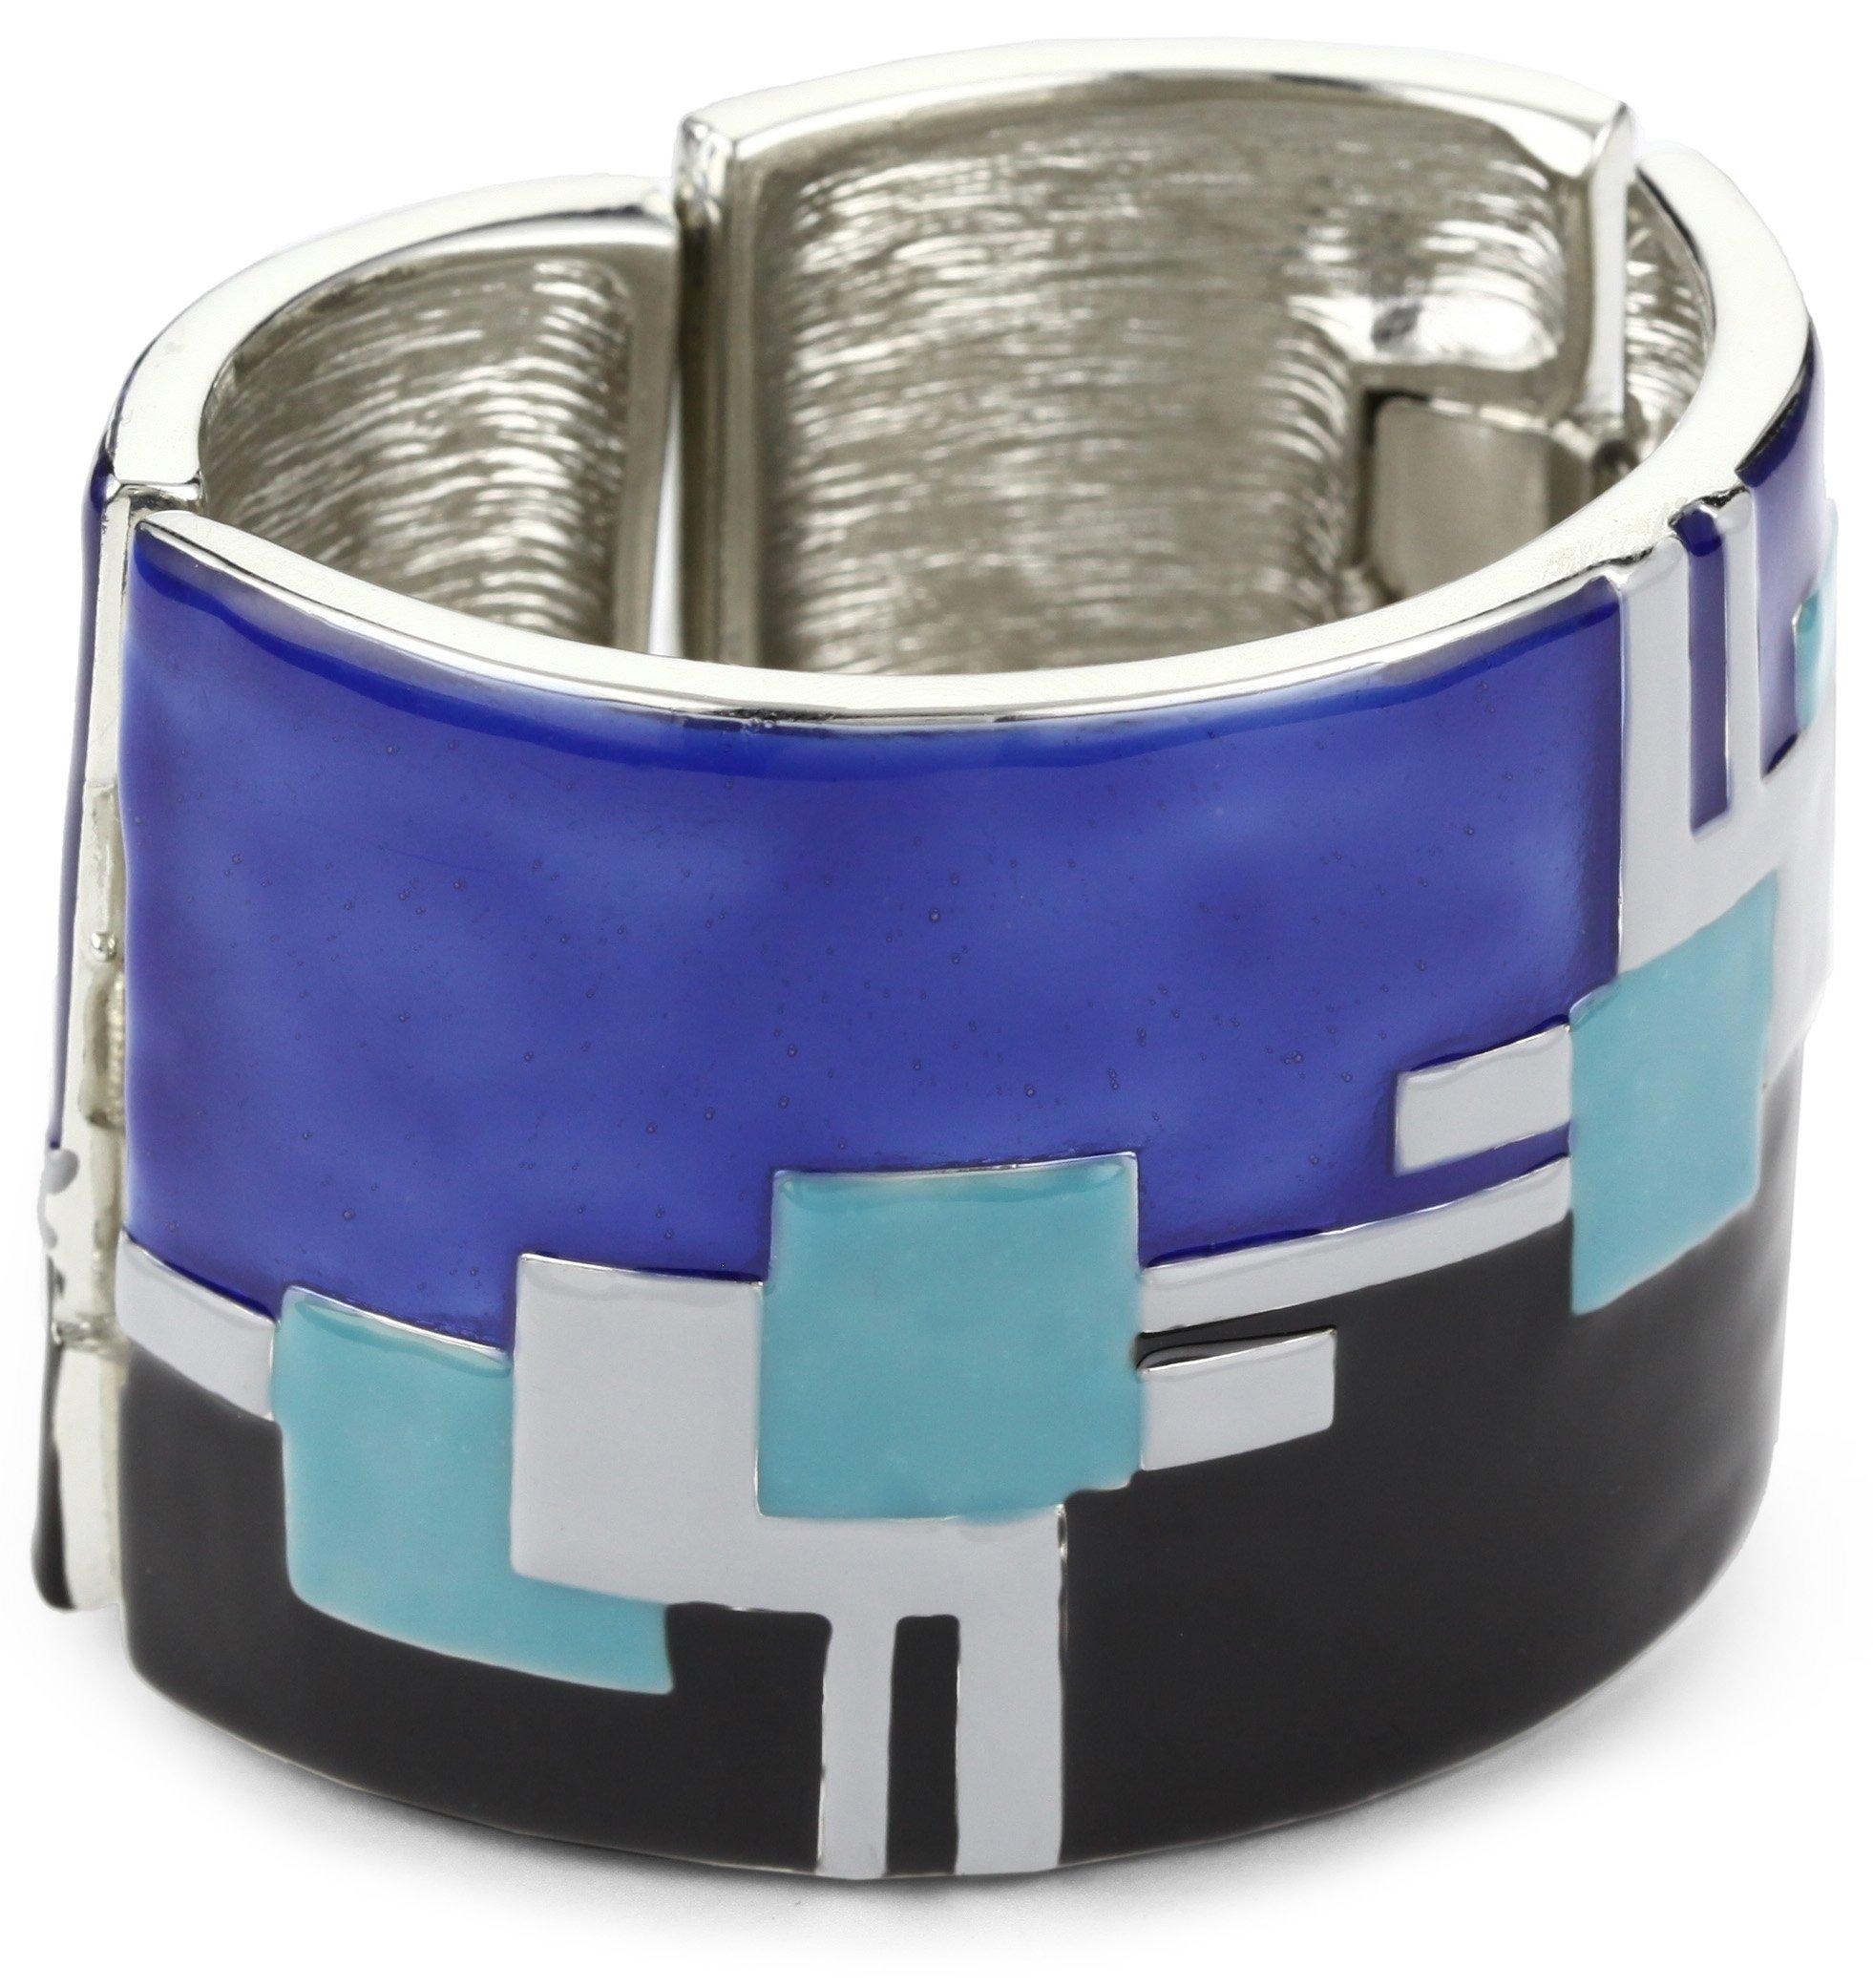 Kenneth Jay Lane ''Deco'' Rhodium, Cobalt and Turquoise-Color Enamel Cuff Bracelet